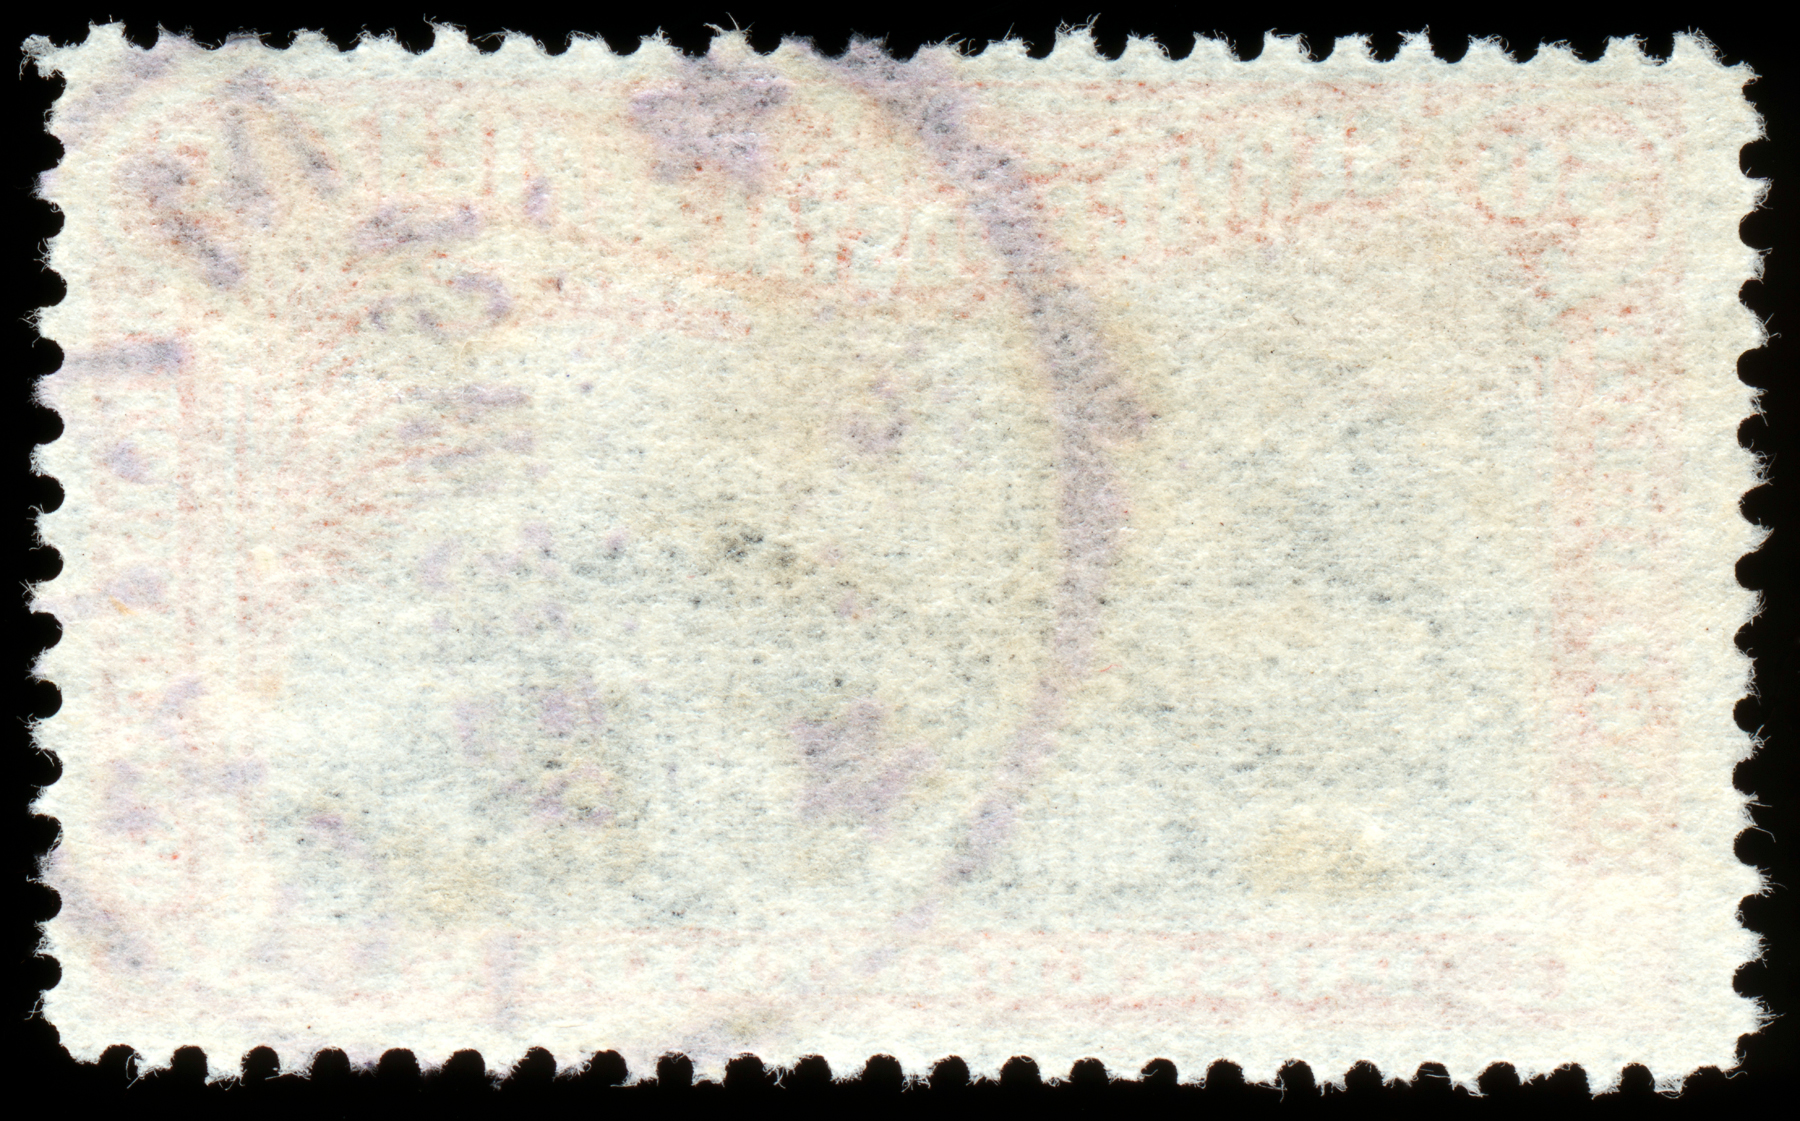 Old Blank Stamp, Poste, Postal, Postmark, Rectangular, HQ Photo